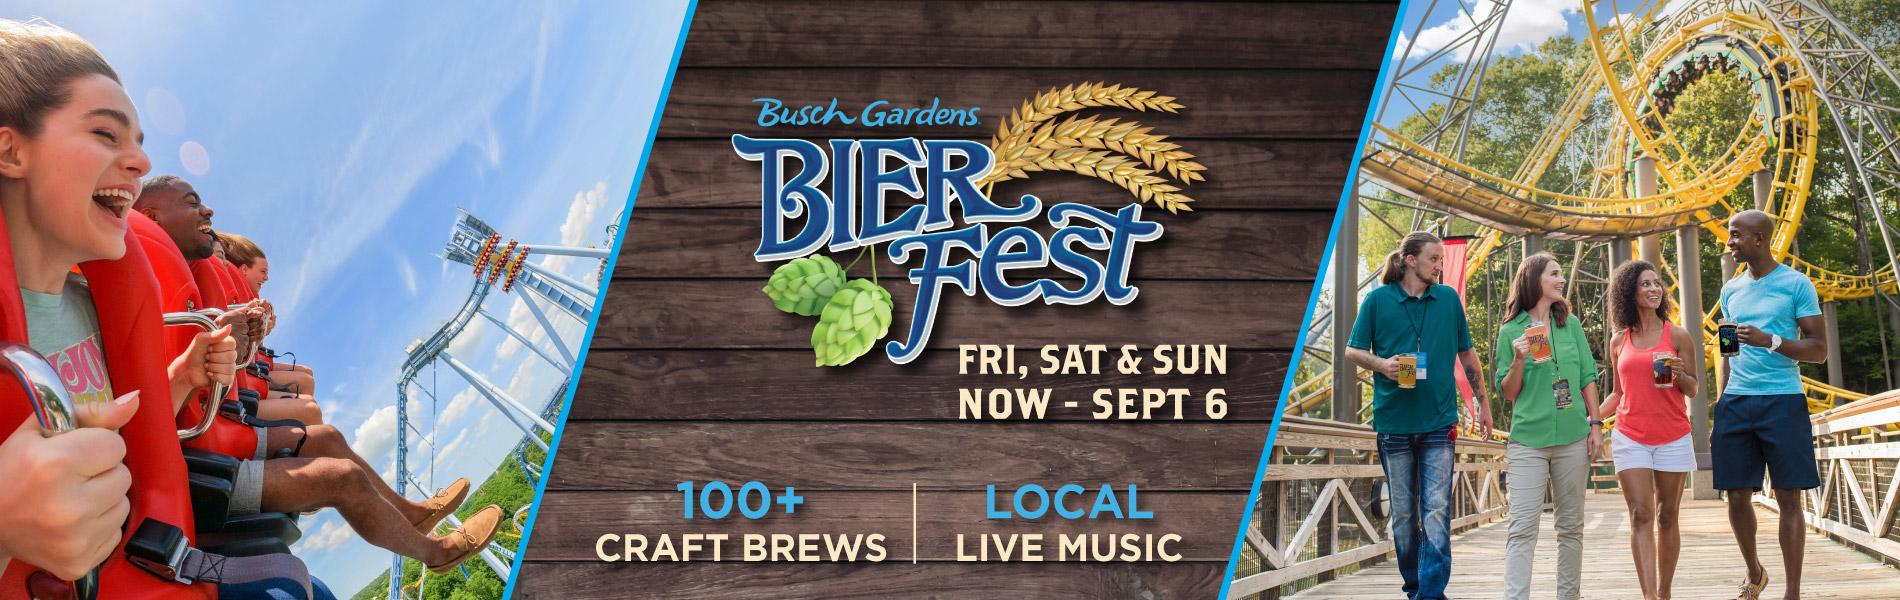 Bier Fest at Busch Gardens Williamsburg features 100+ craft brews and Local Live Music